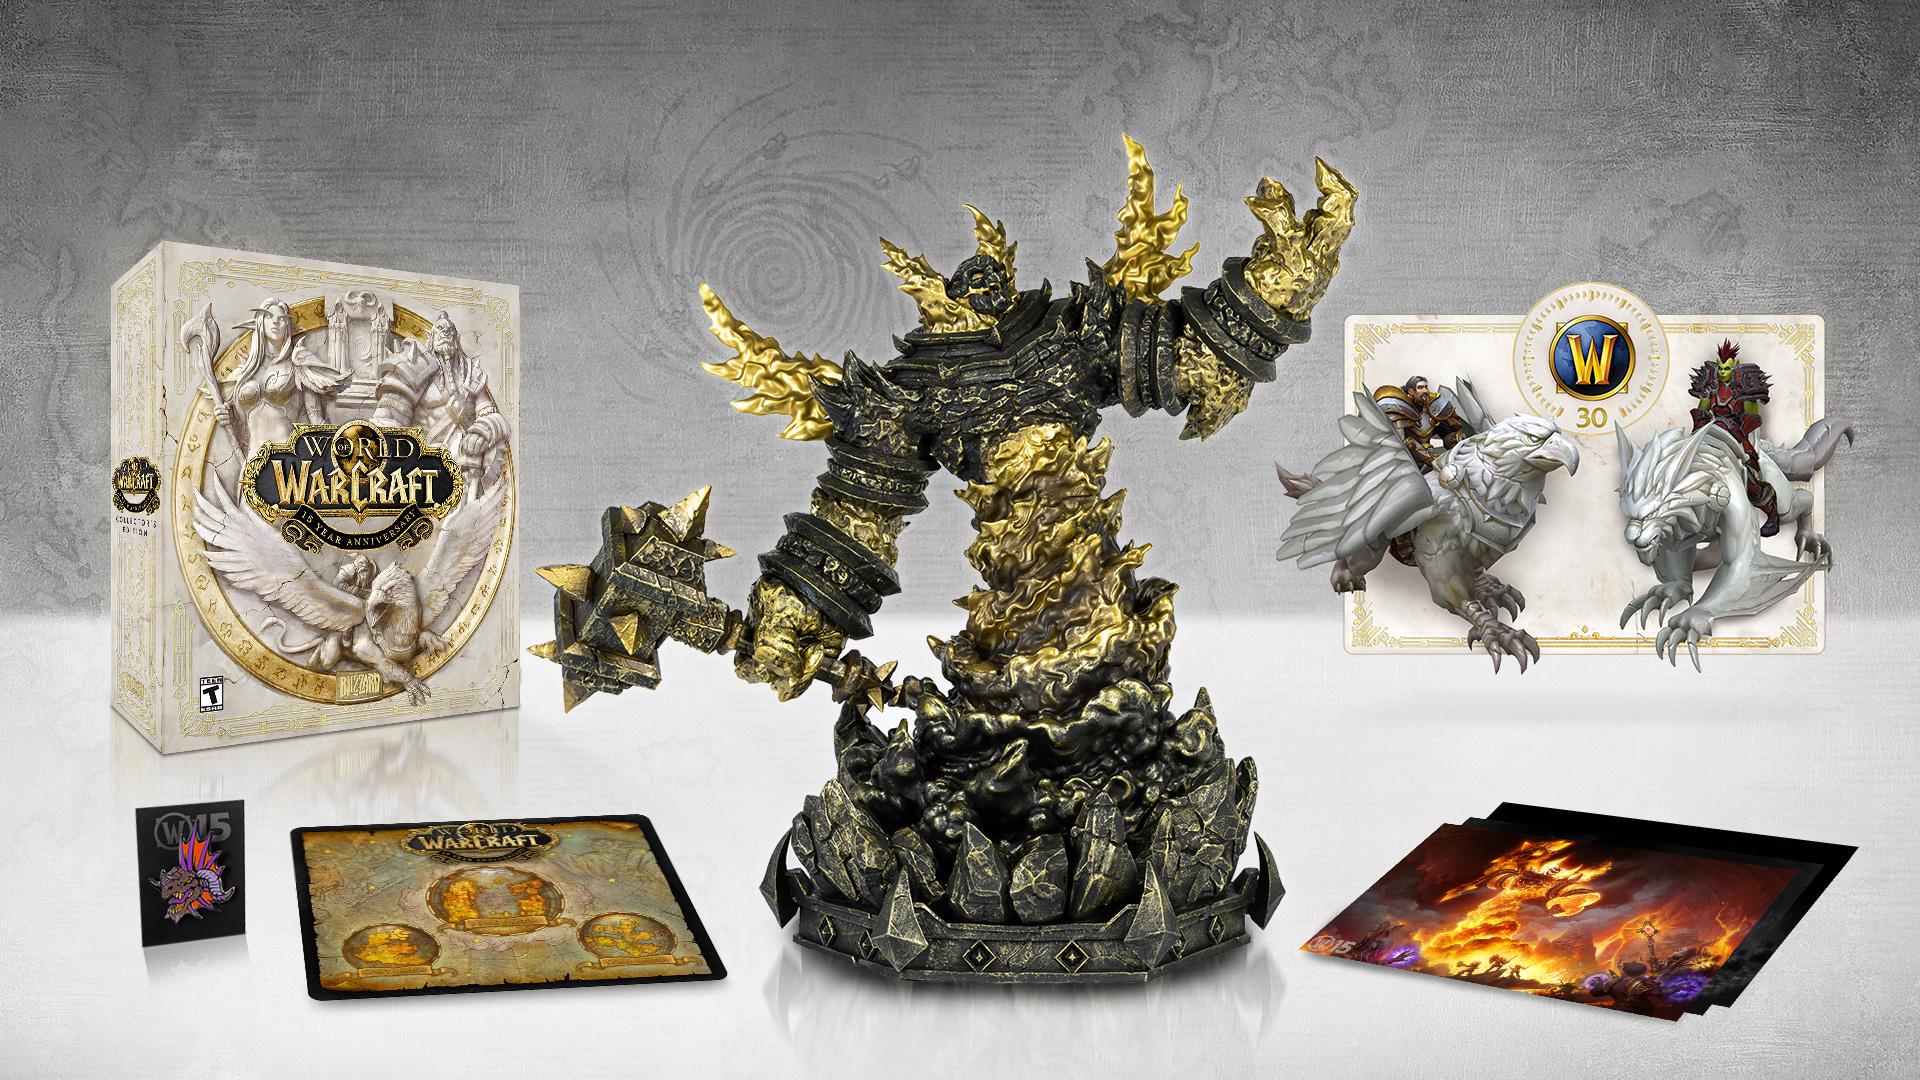 La collector anniversaire de WoW contient une imposante statue de Ragnaros